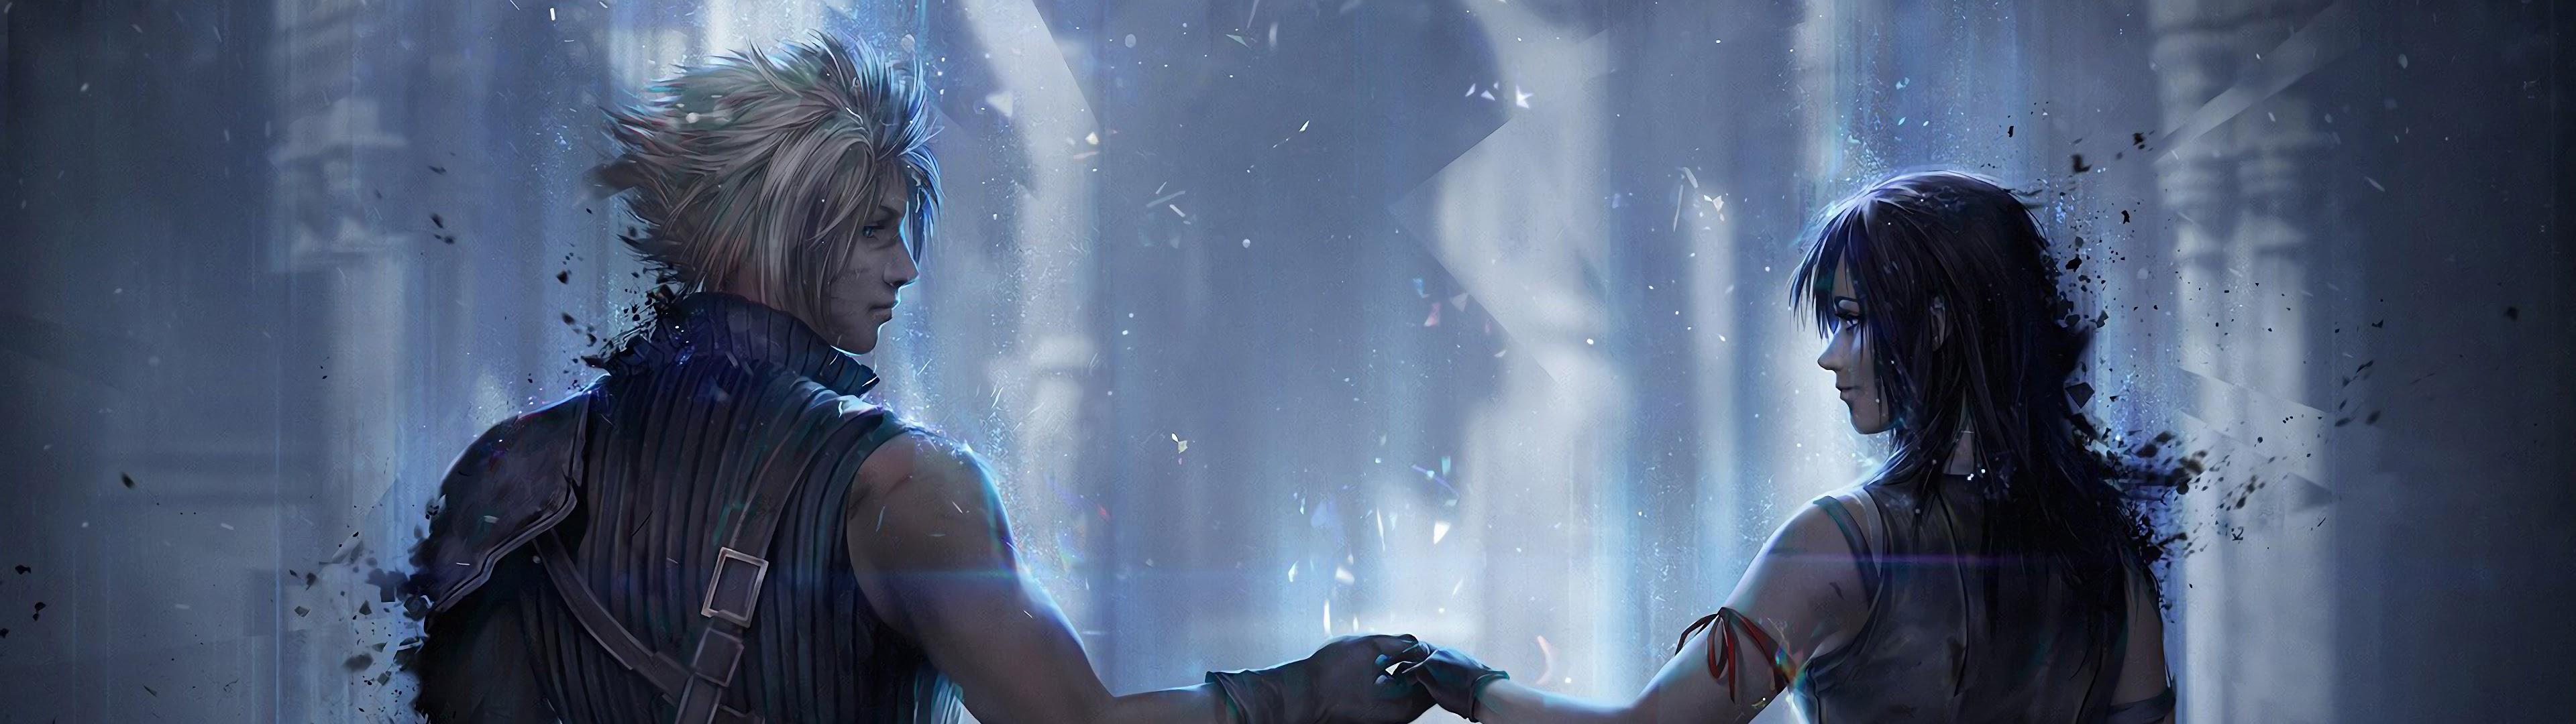 Cloud Strife Tifa Lockhart Final Fantasy 7 Remake 4k Wallpaper 33